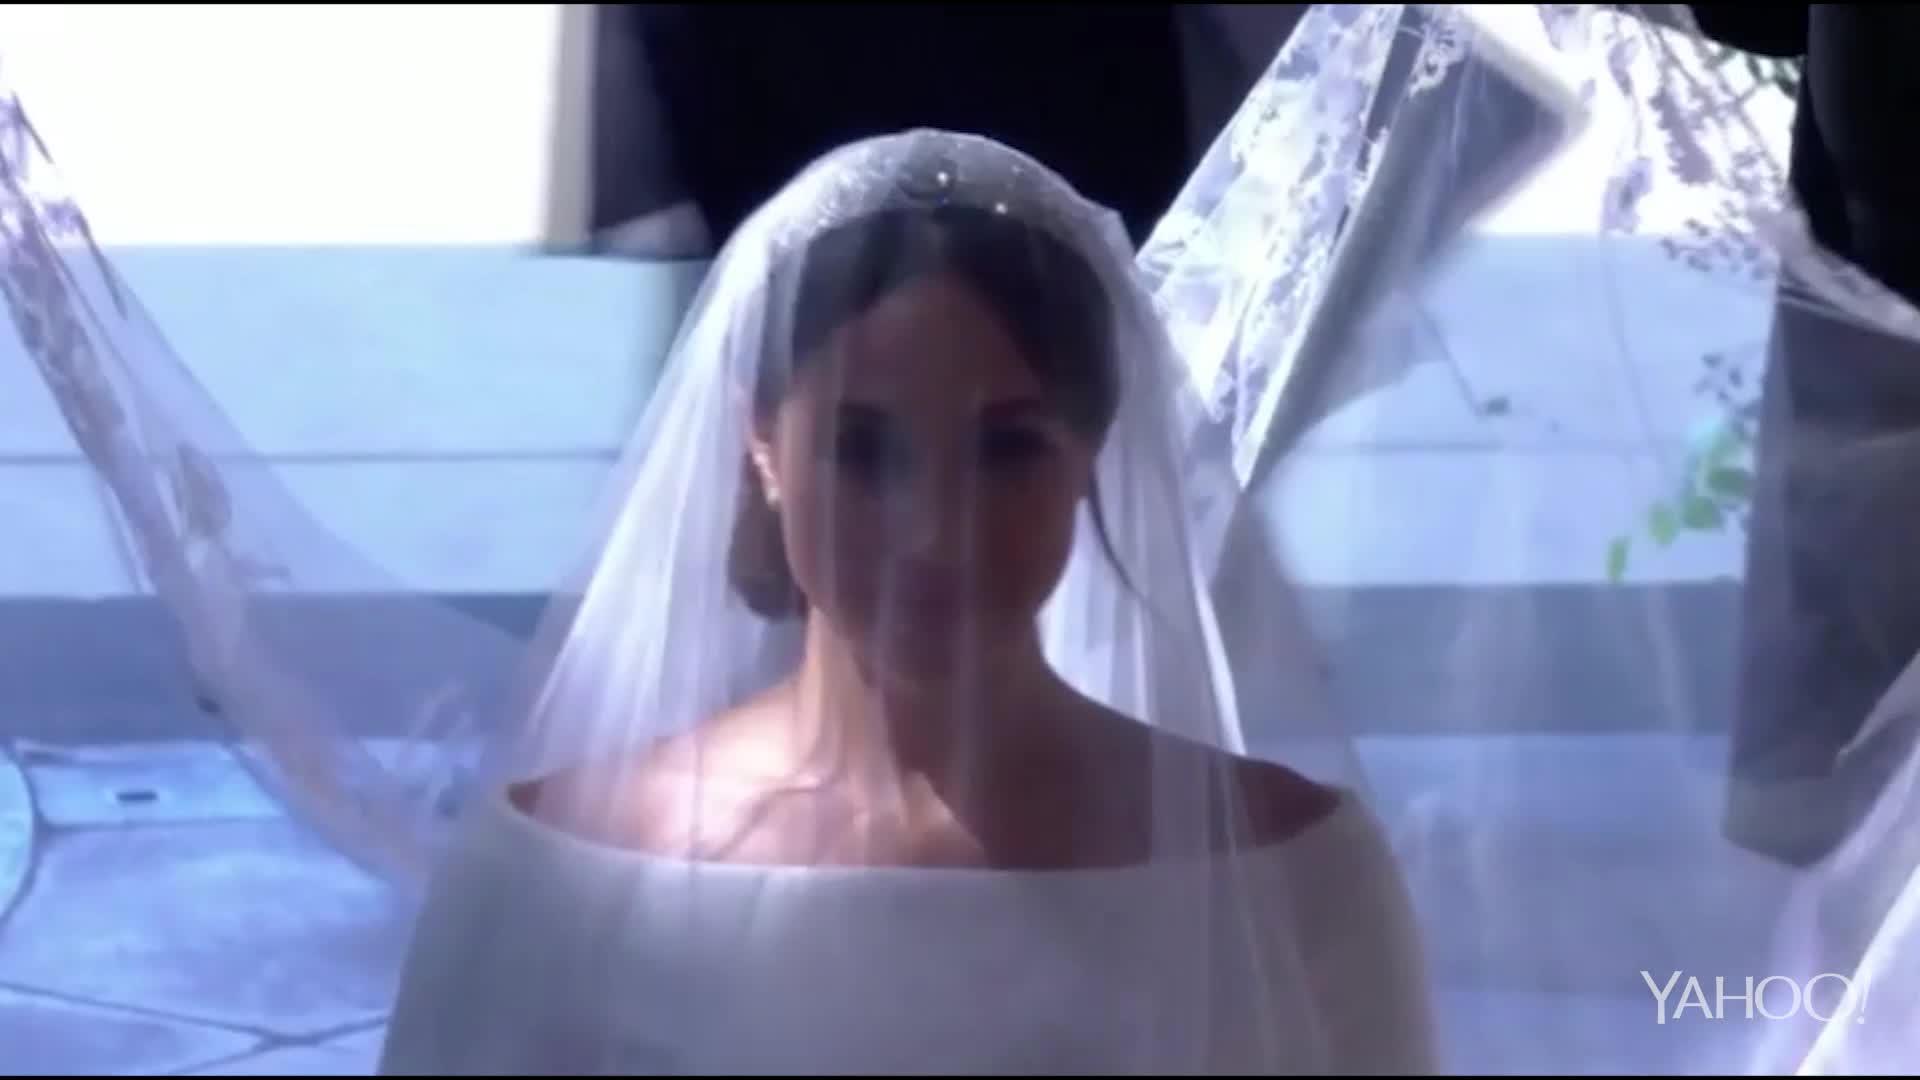 Royal Wedding Meghan walks down the aisle